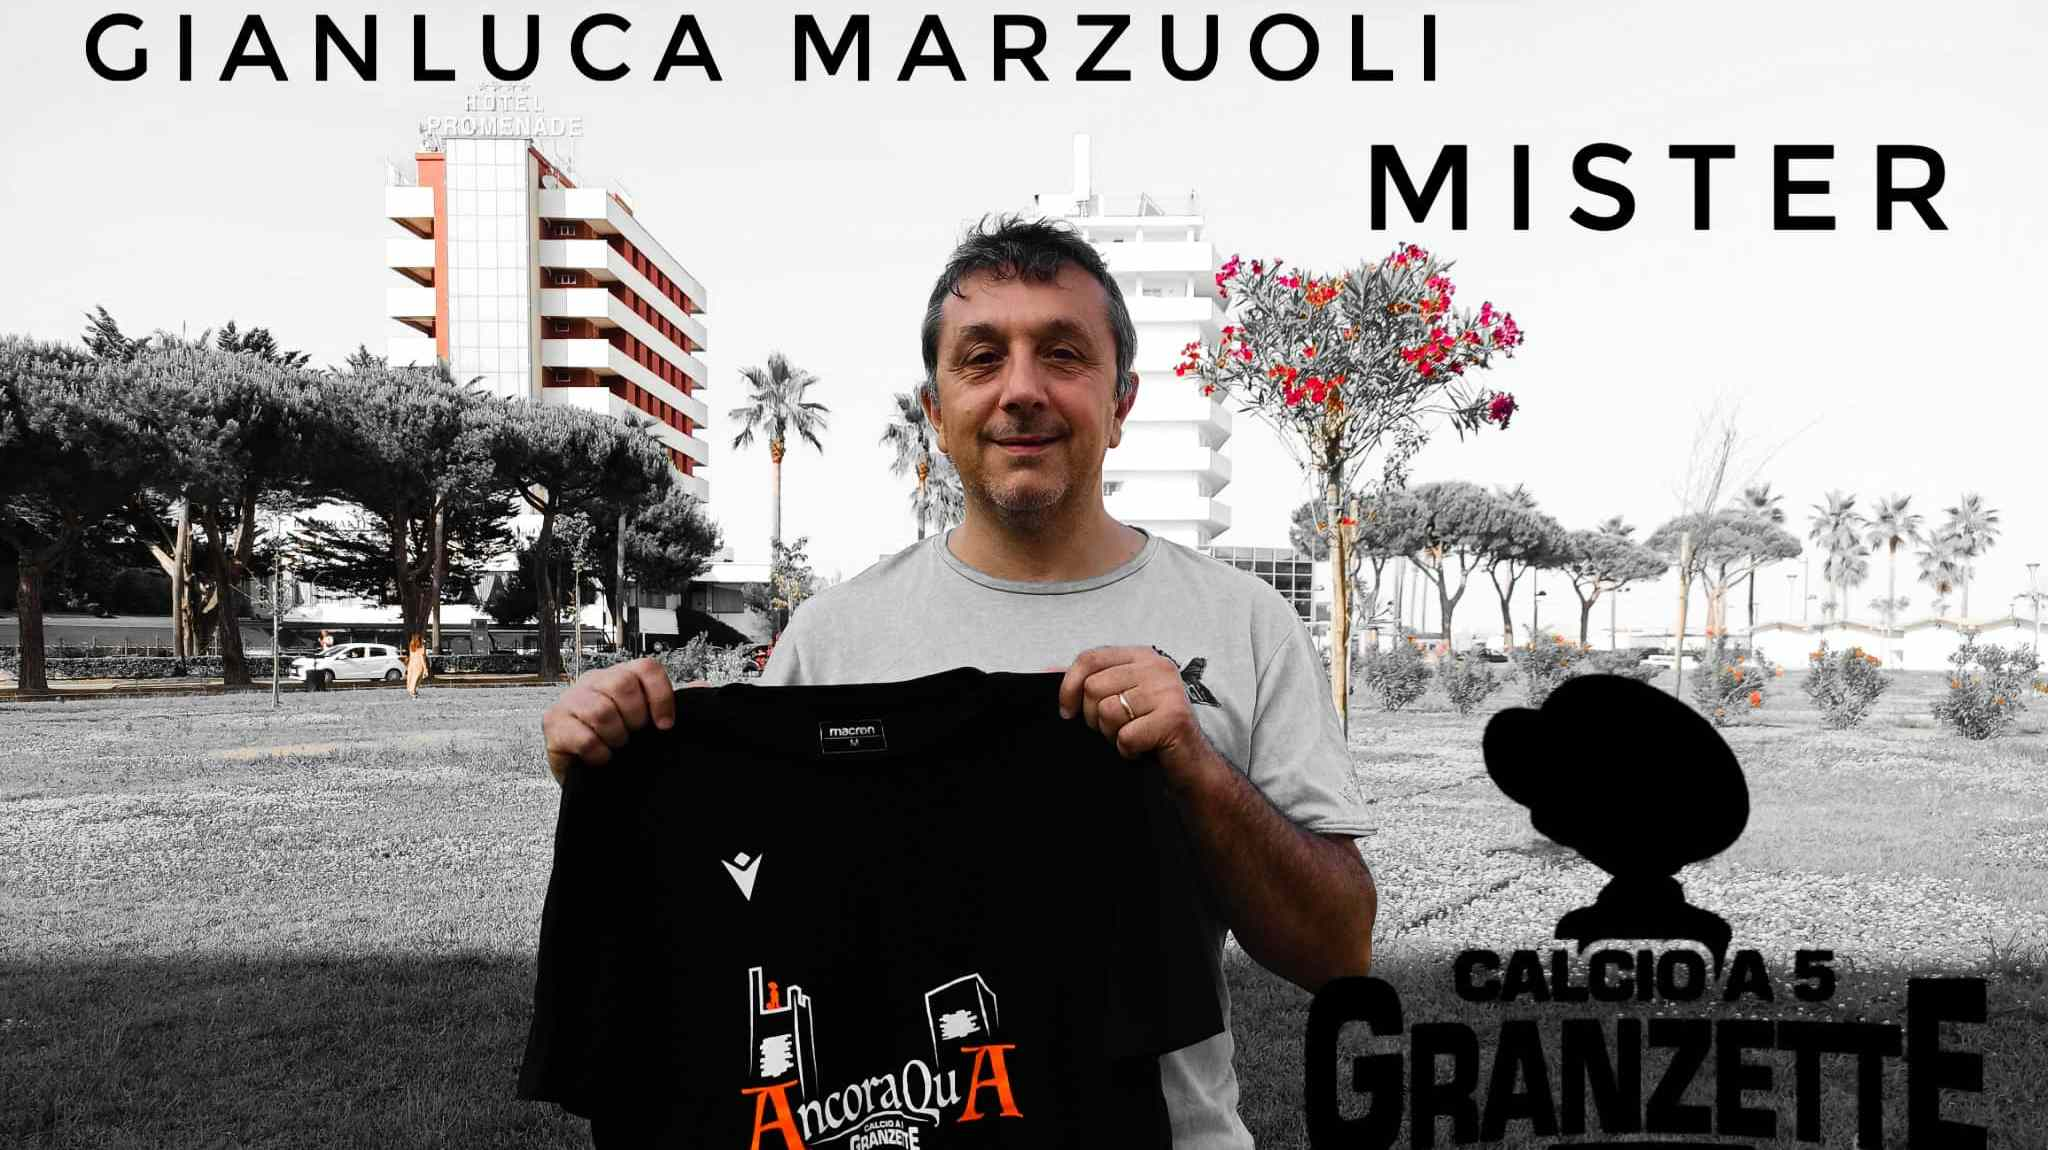 granzette marzuoli